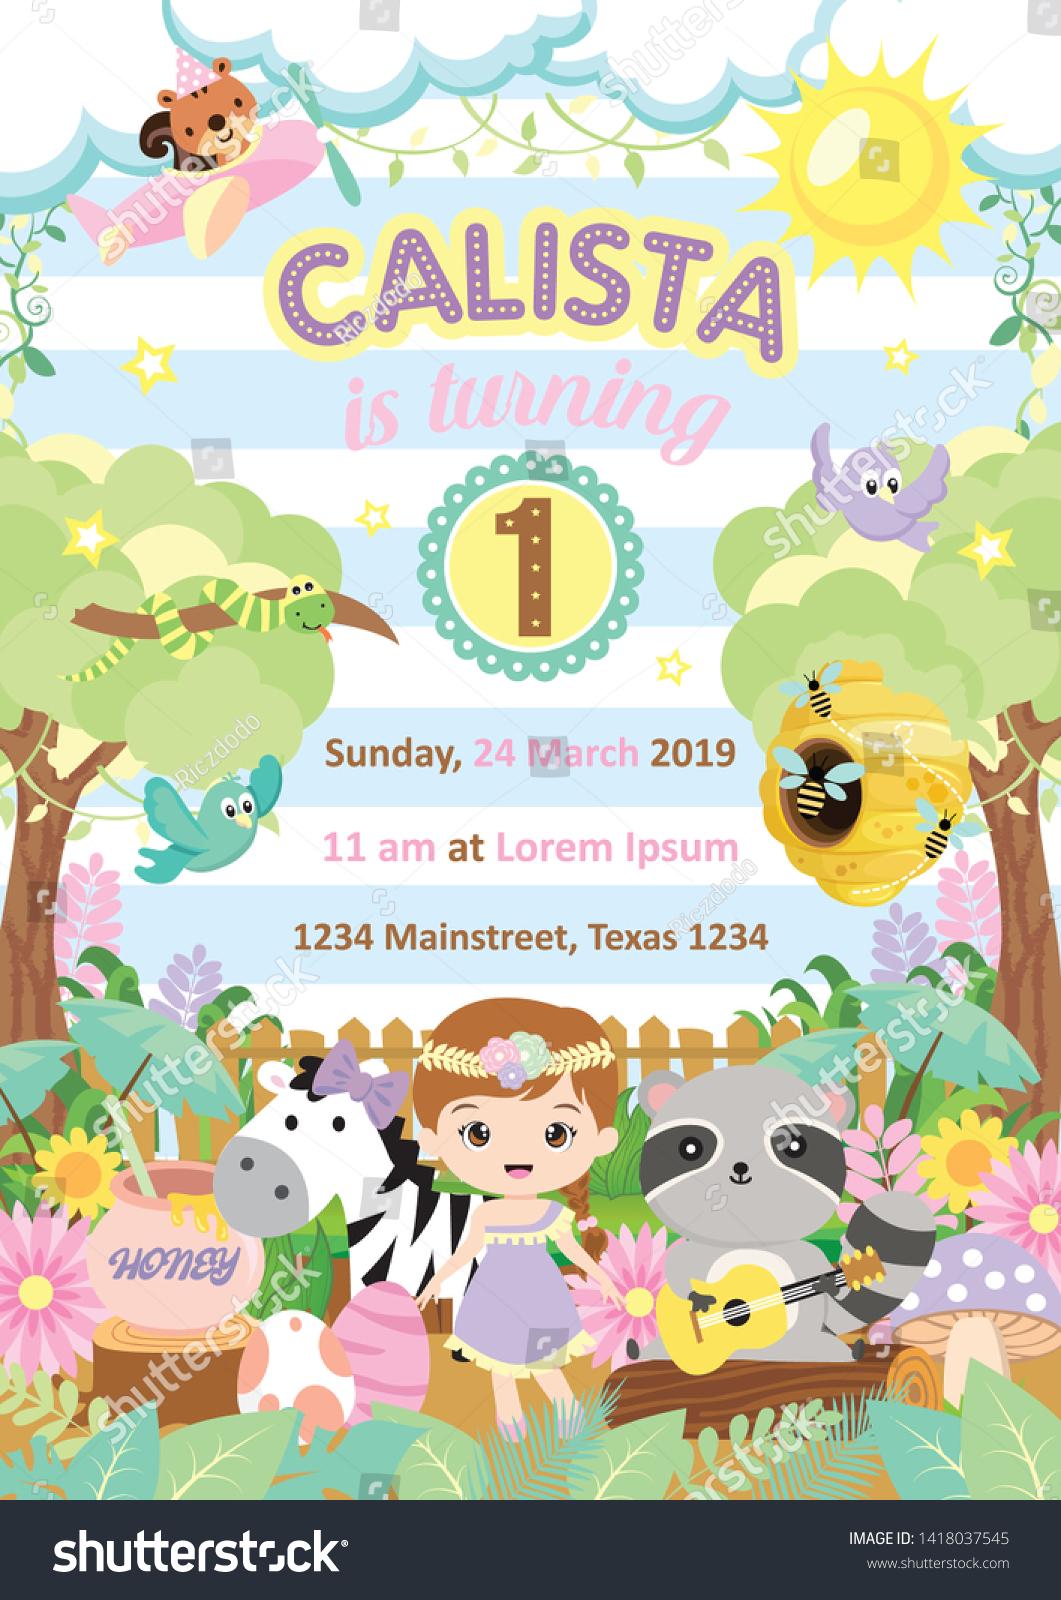 Kids Birthday Party Invitation Card Cute Stock Illustration